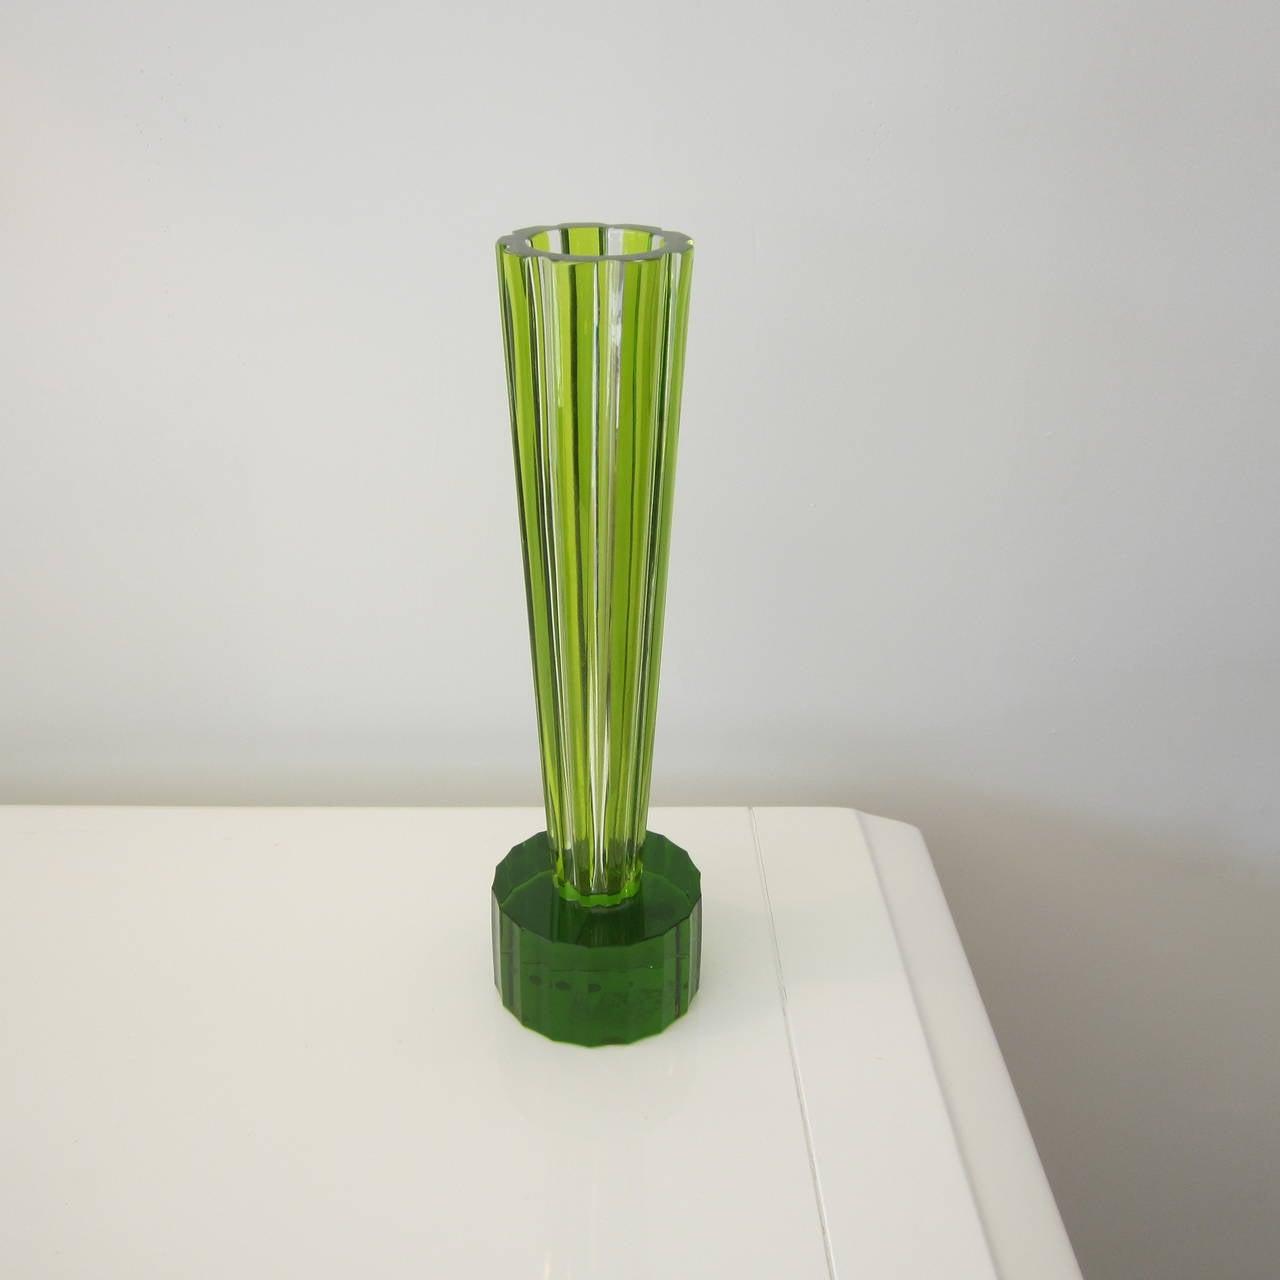 Ettore Sottsass Crystal Trumpet Vase for Baccarat Signed For Sale ... for Ettore Sottsass Shiva Vase  53kxo